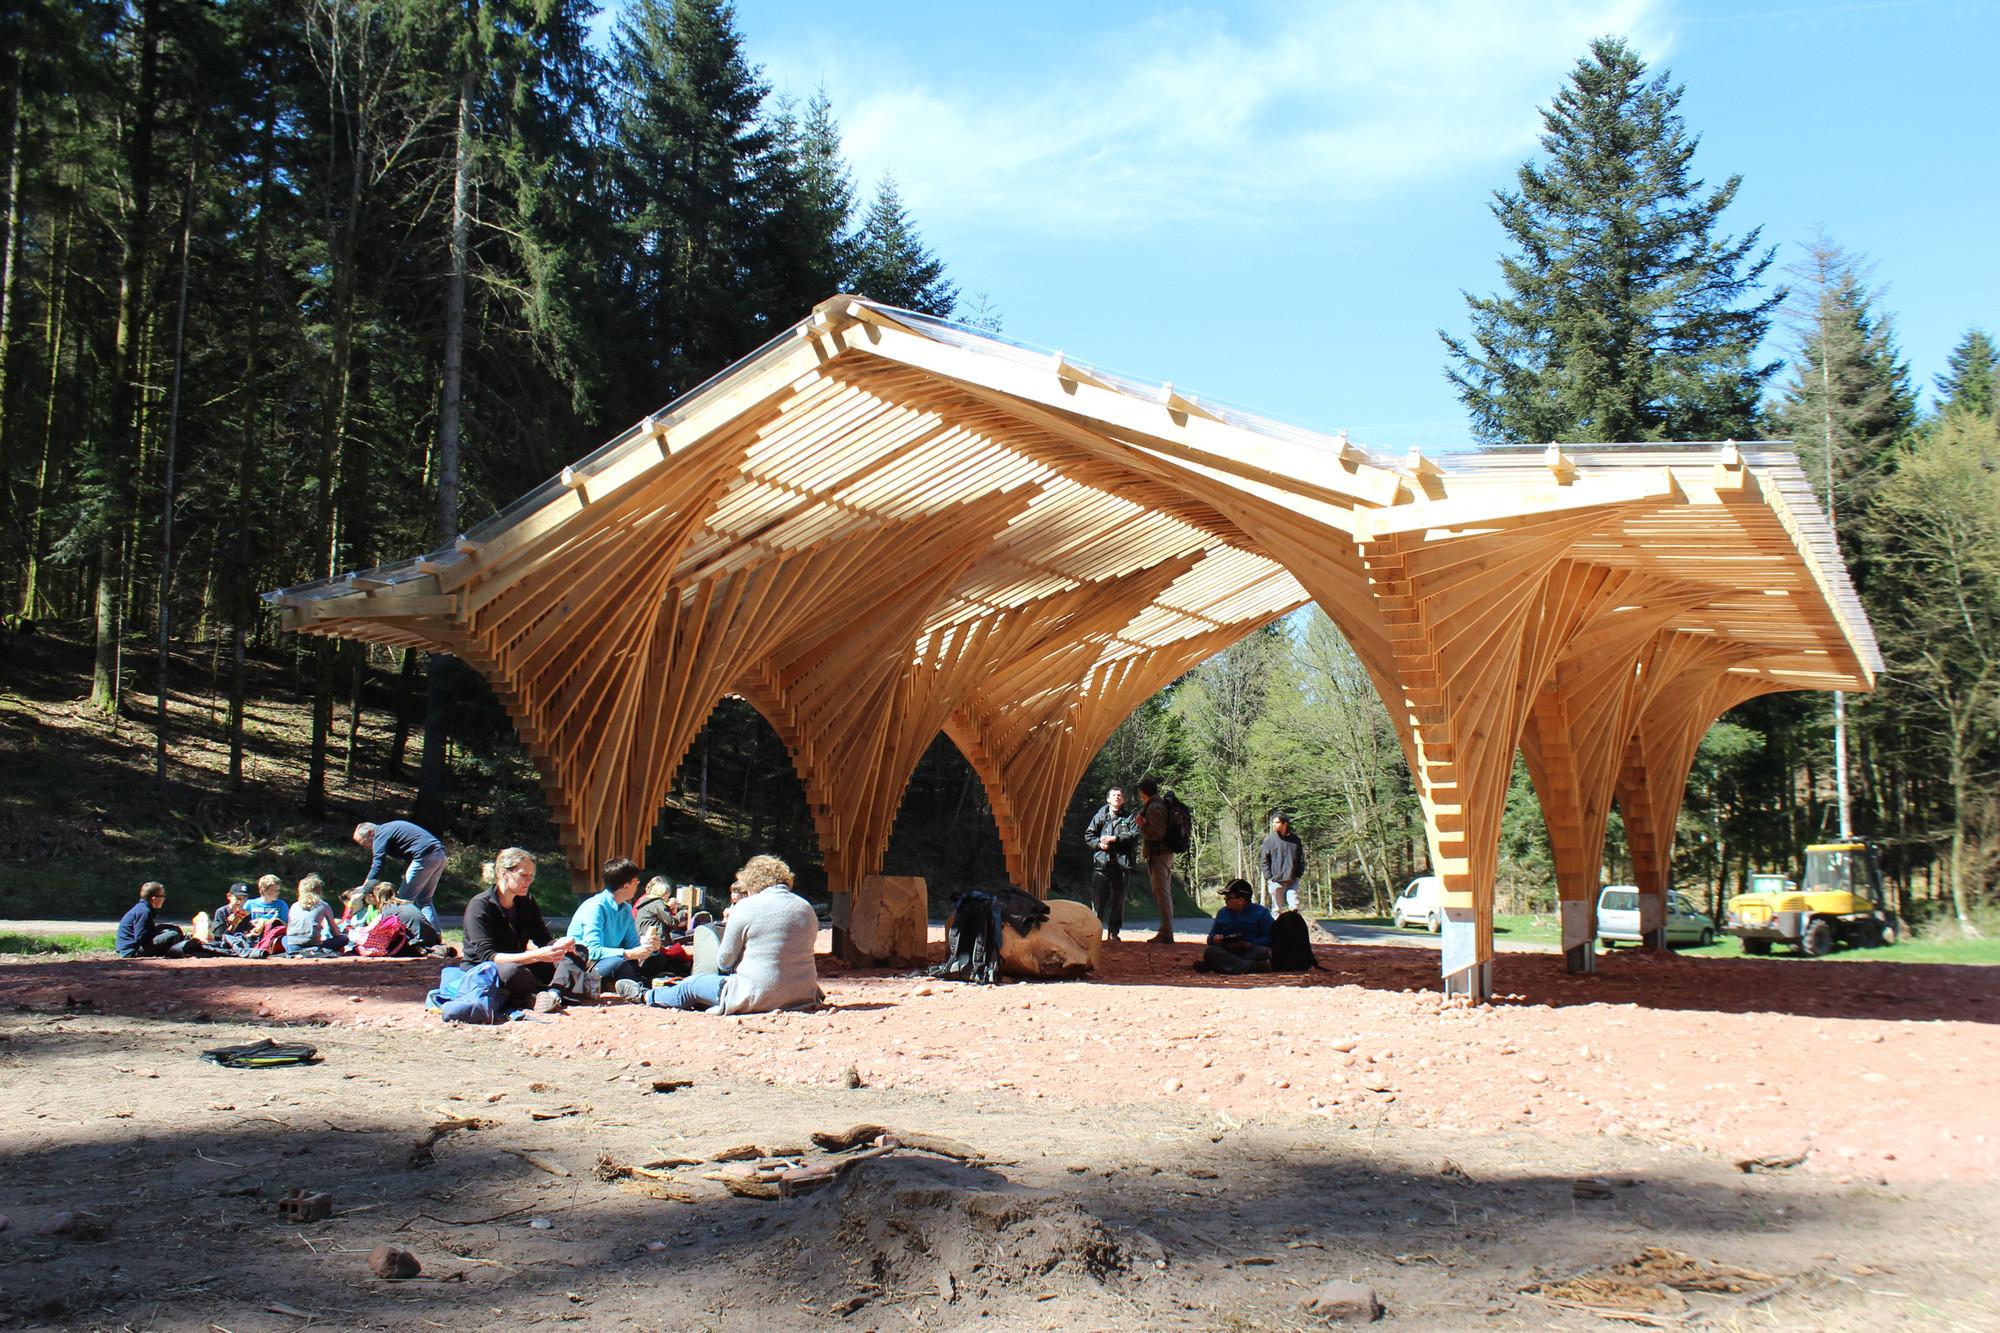 La Creación de un Refugio Forestal en Bertrichamp / Studiolada Architectes + Yoann Saehr Architect, © Christophe Aubertin